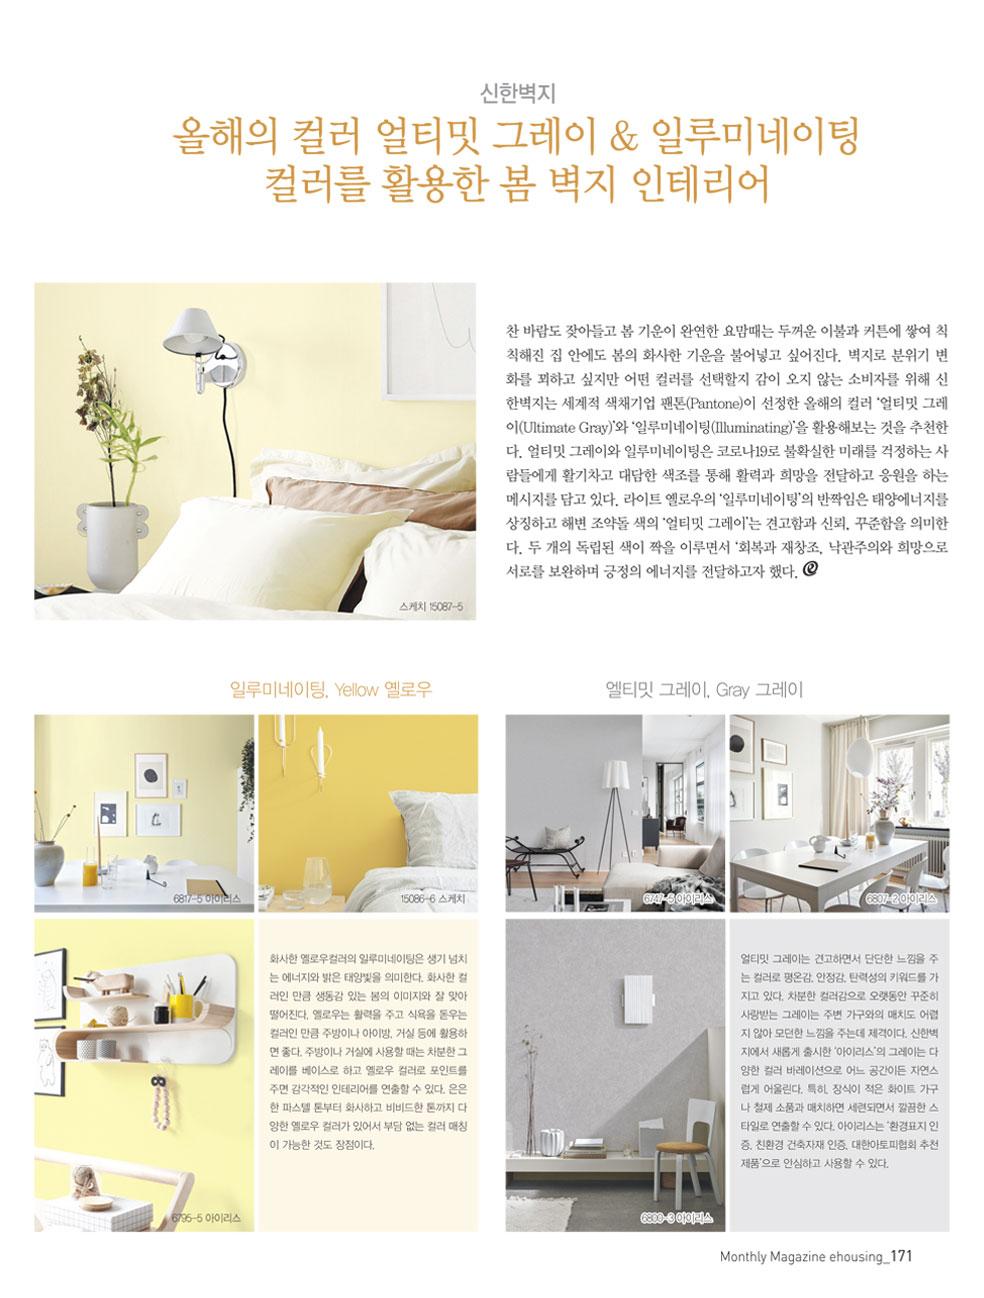 SNS_이하우징21-4_1.jpg